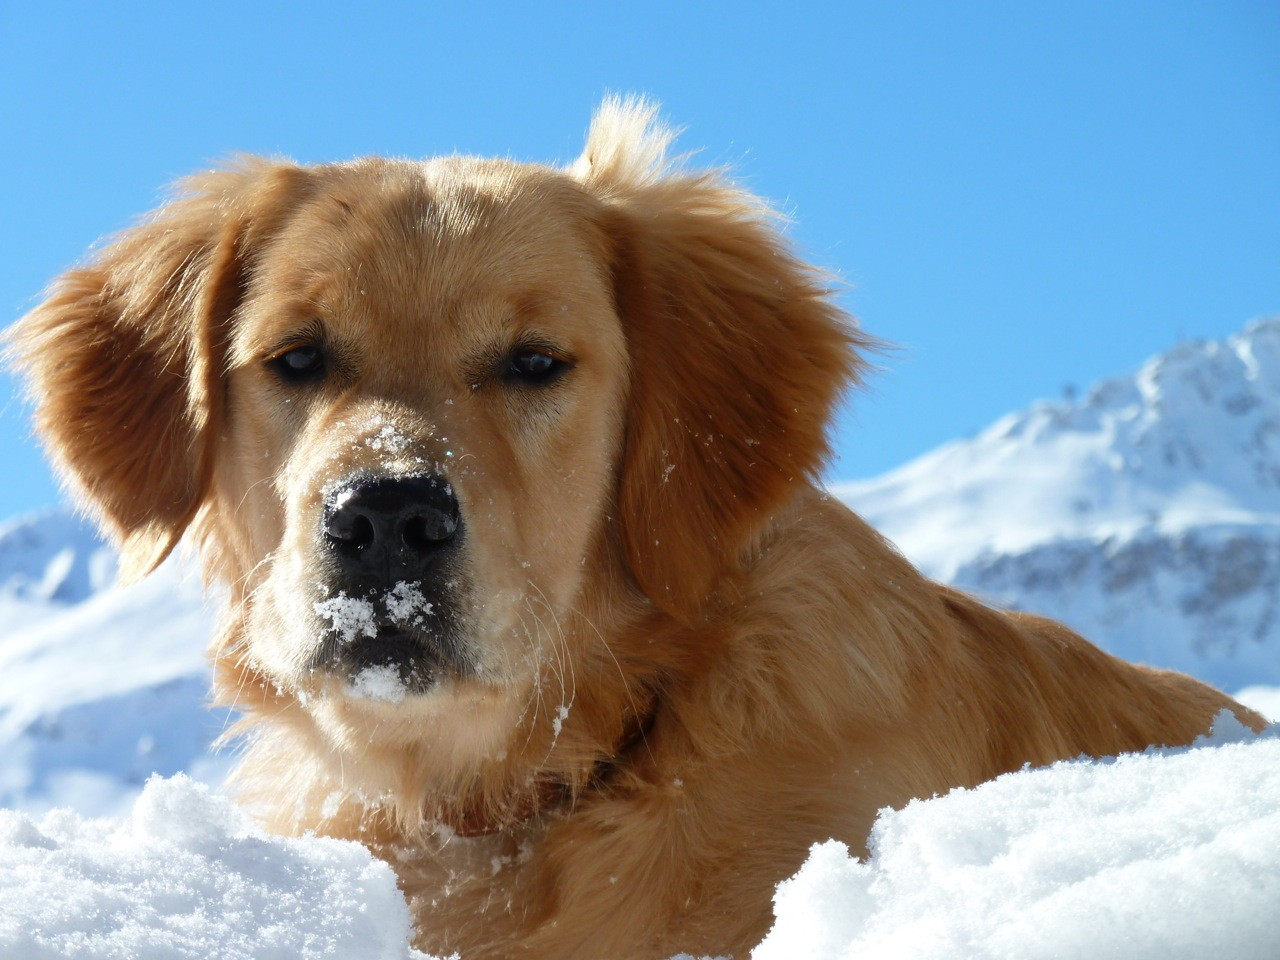 Bandit, la neige lui va si bien